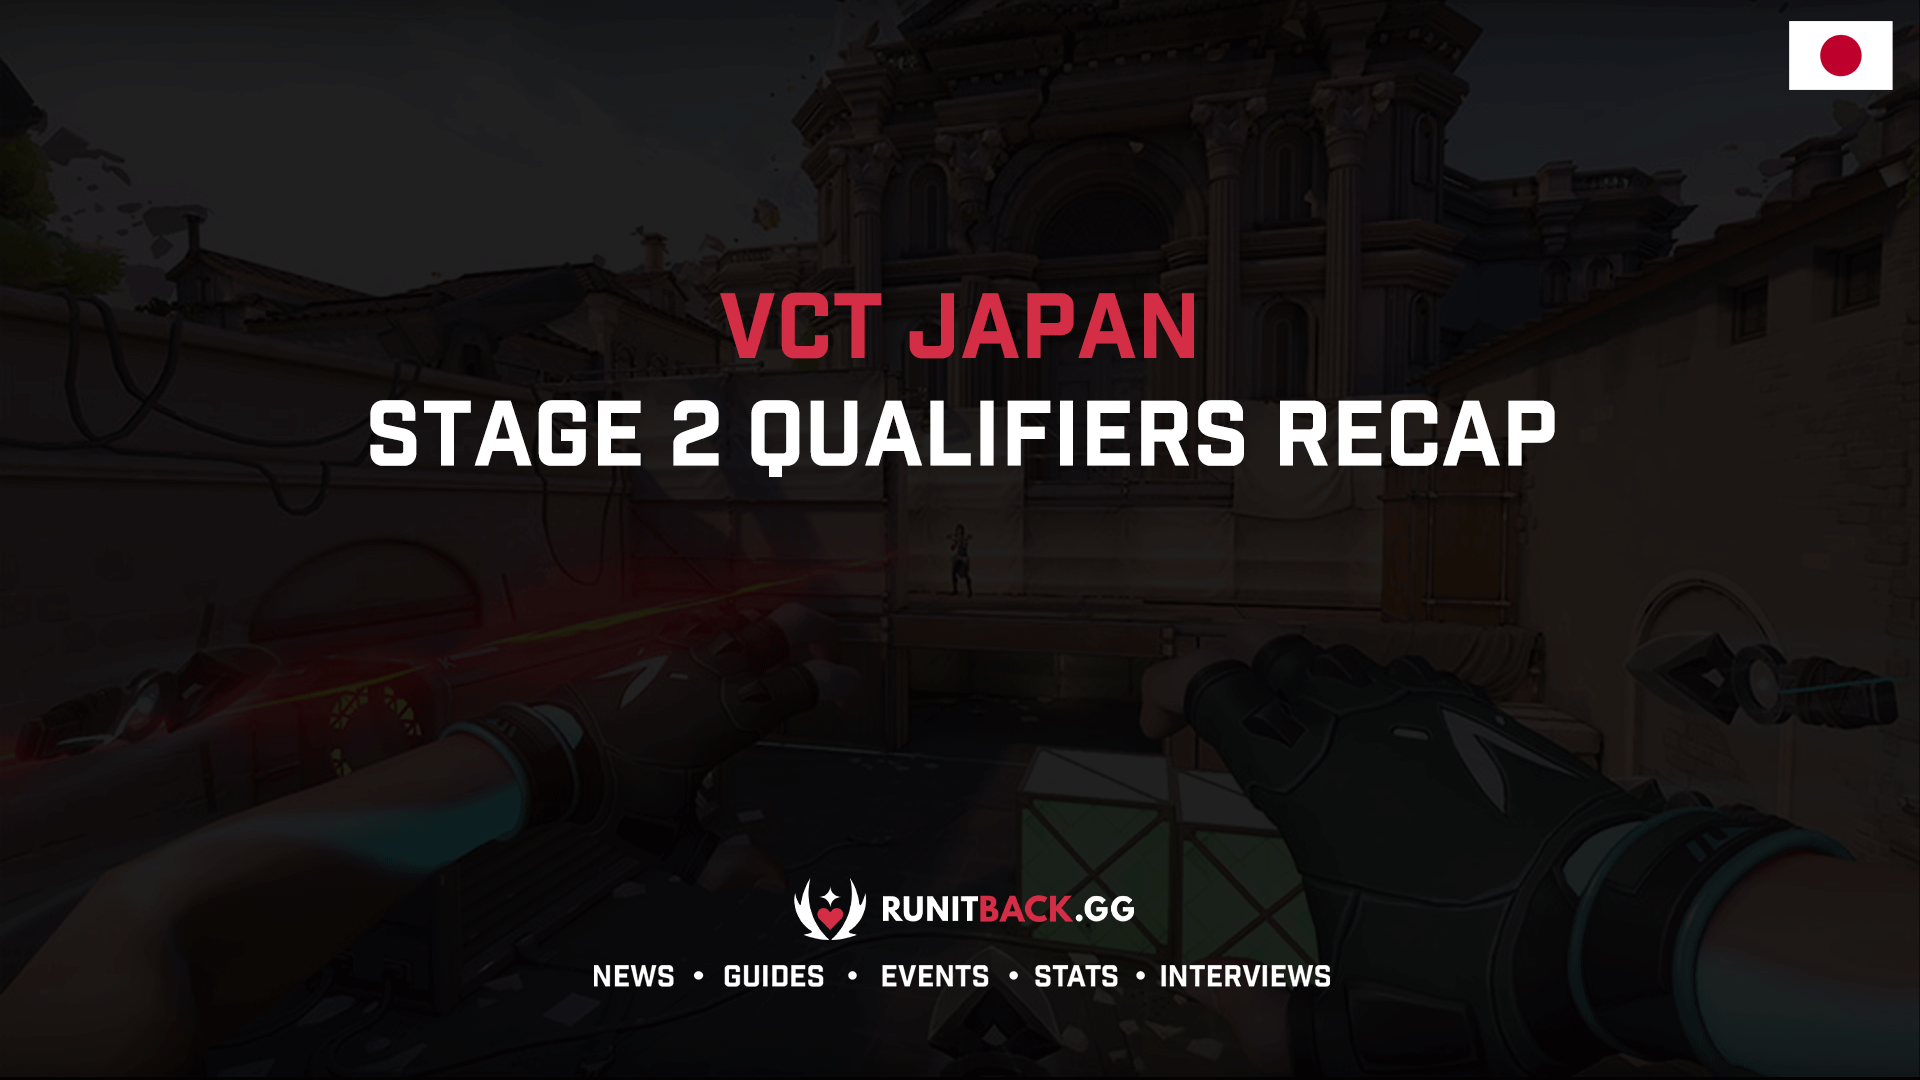 VCT Japan Stage 2 Qualifiers Recap